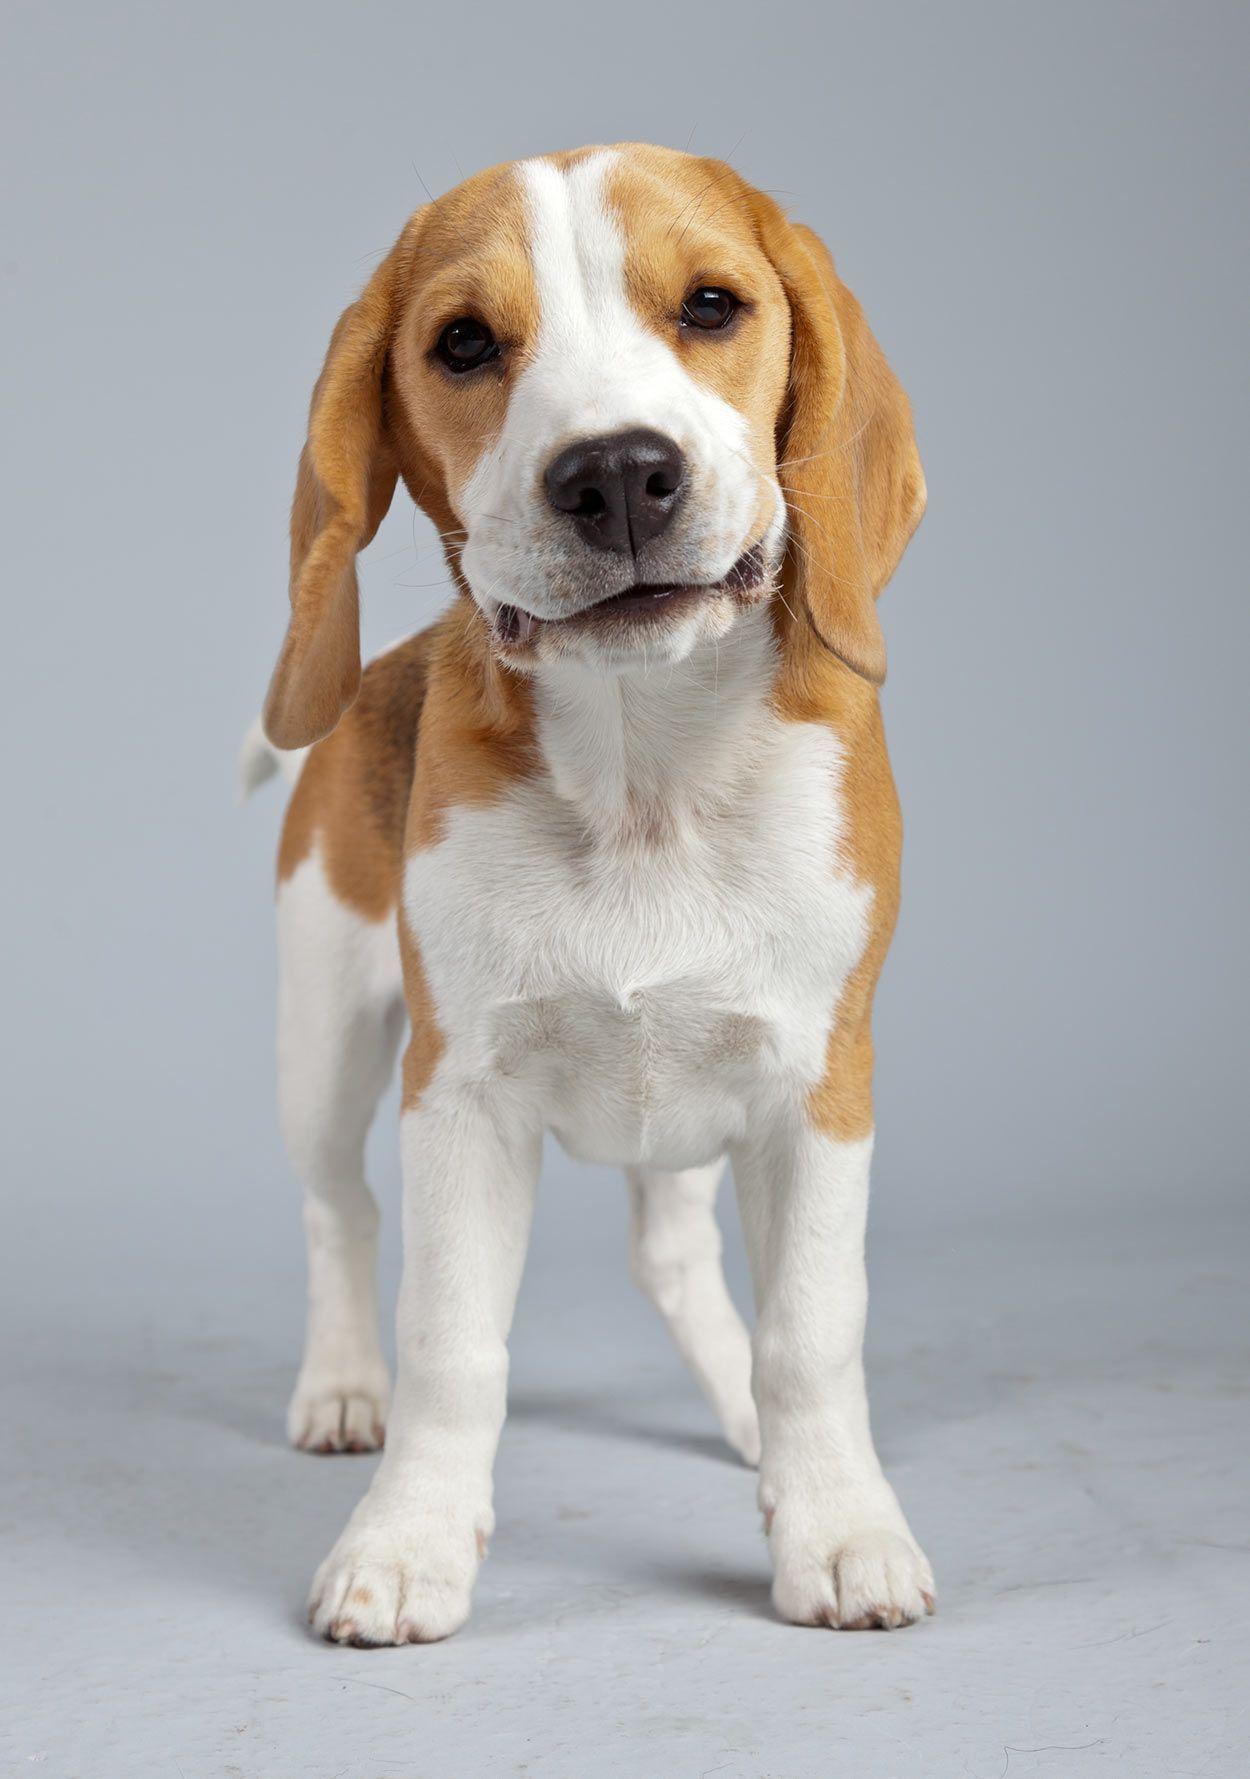 Lemon Beagle Beagle Puppy Lemon Beagle Beagle Dog